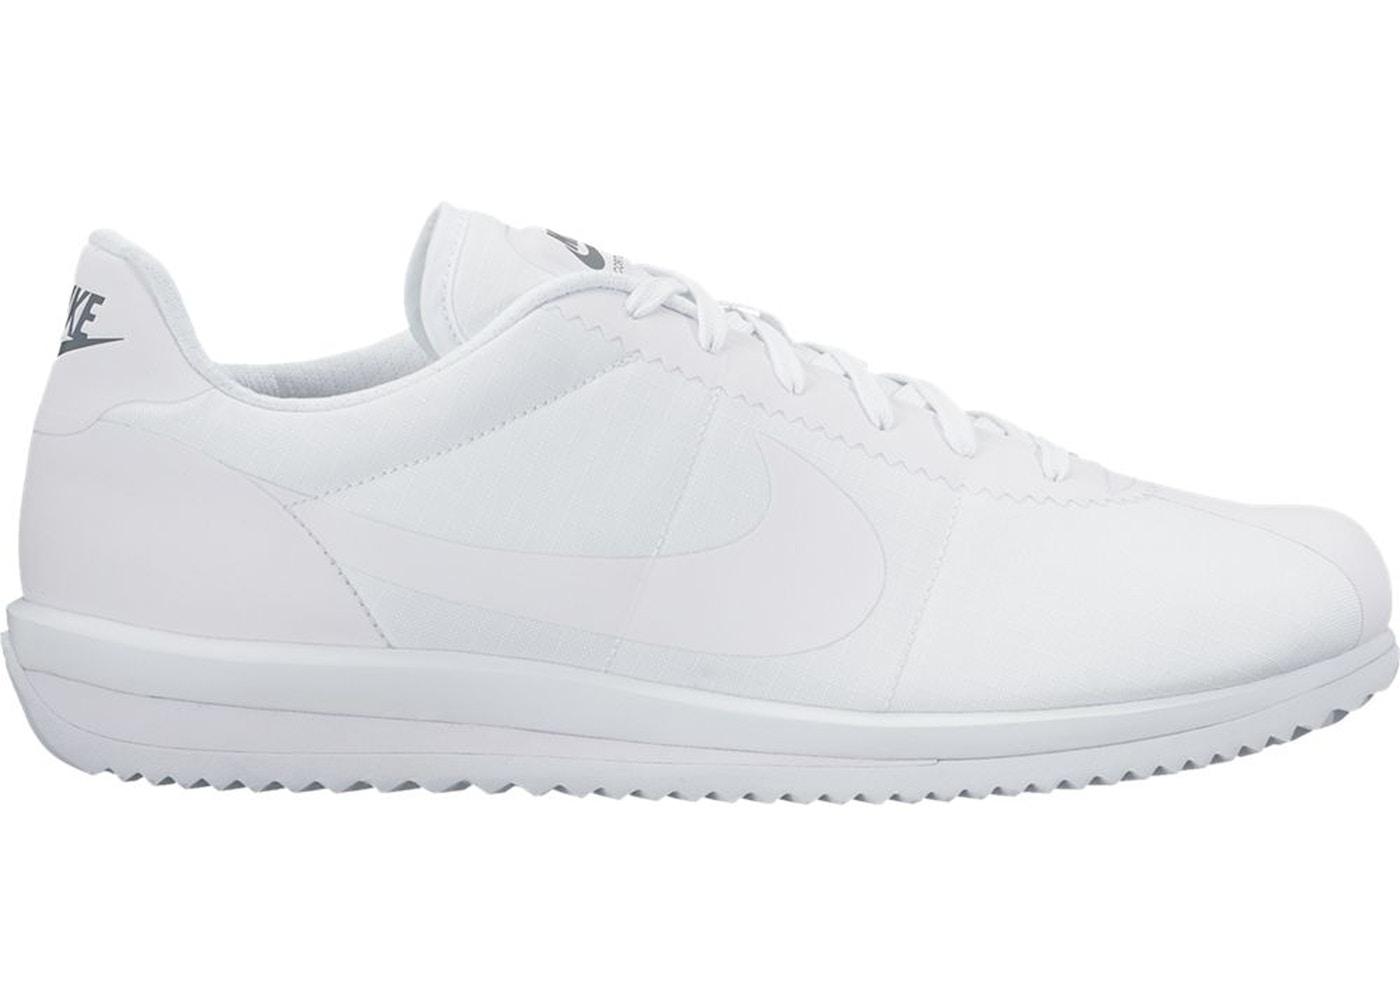 Ultra Cortez Nike Nike Nike White White Cortez Nike Ultra Ultra White Cortez Wb9DeH2IYE